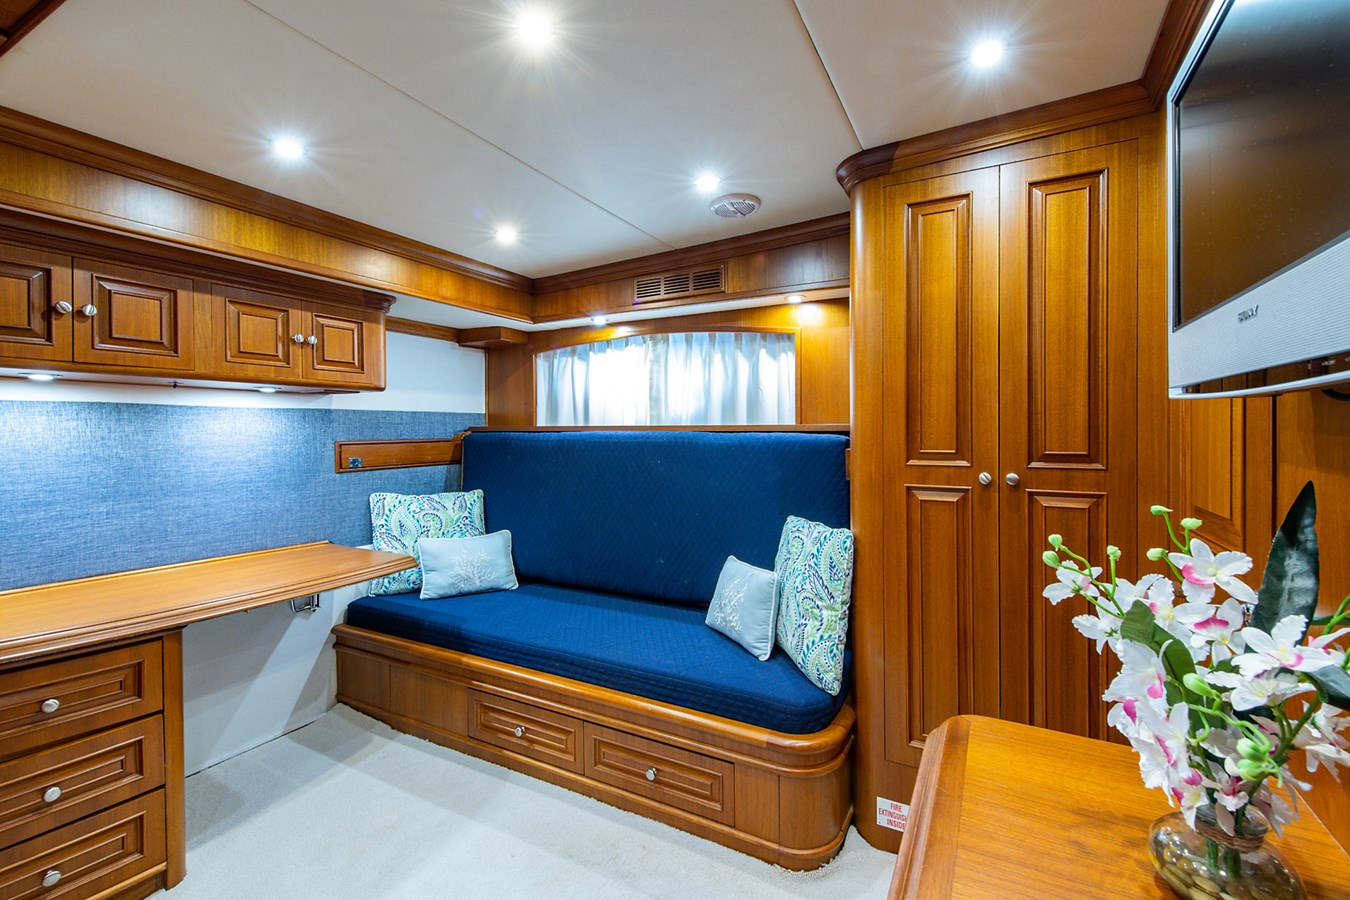 Tout Va Bien_Guest Stateroom-Den3 2005 GRAND BANKS 64 Aleutian RP Motor Yacht 2726180